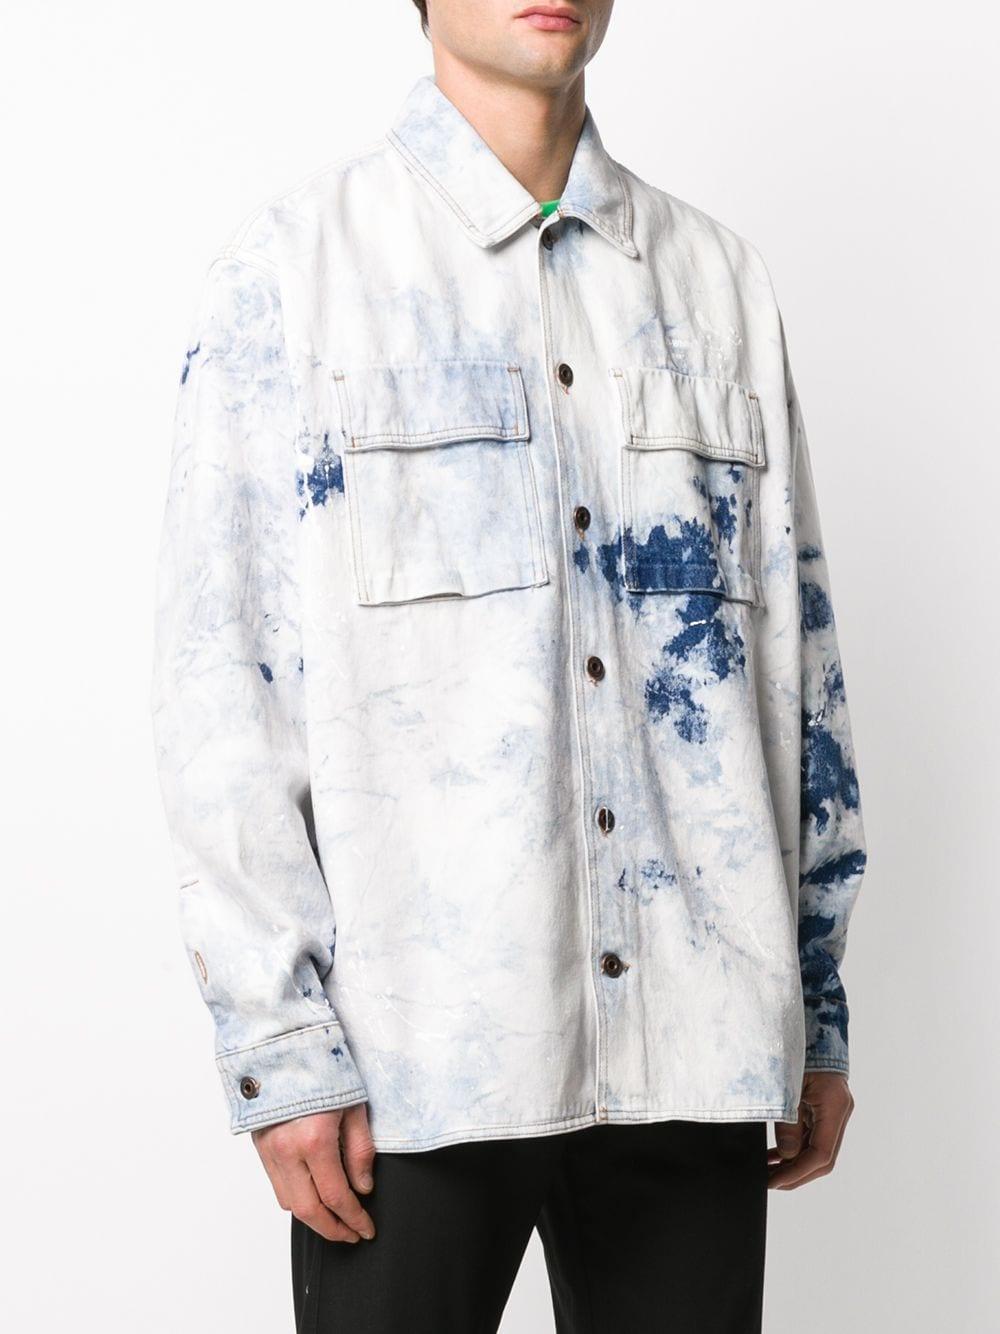 Off-White c/o Virgil Abloh Denim Overhemd in het Blauw voor heren